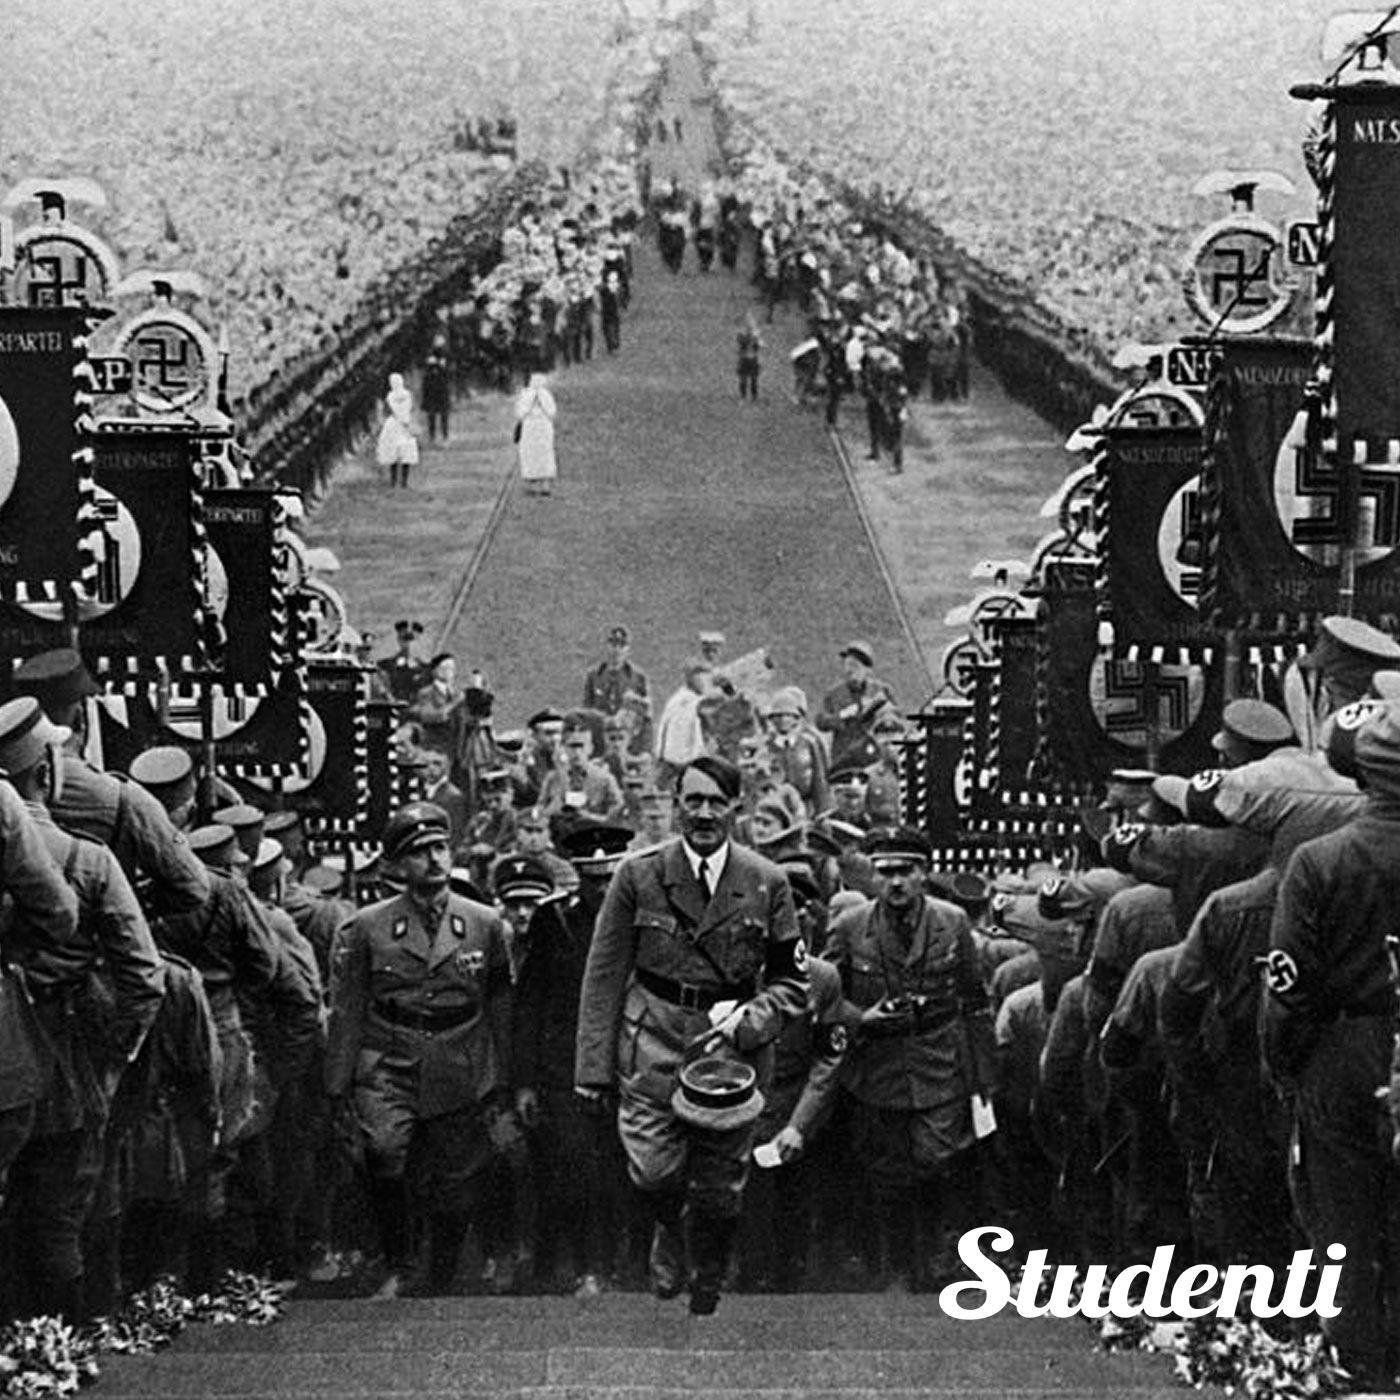 Storia - L'ascesa del nazismo